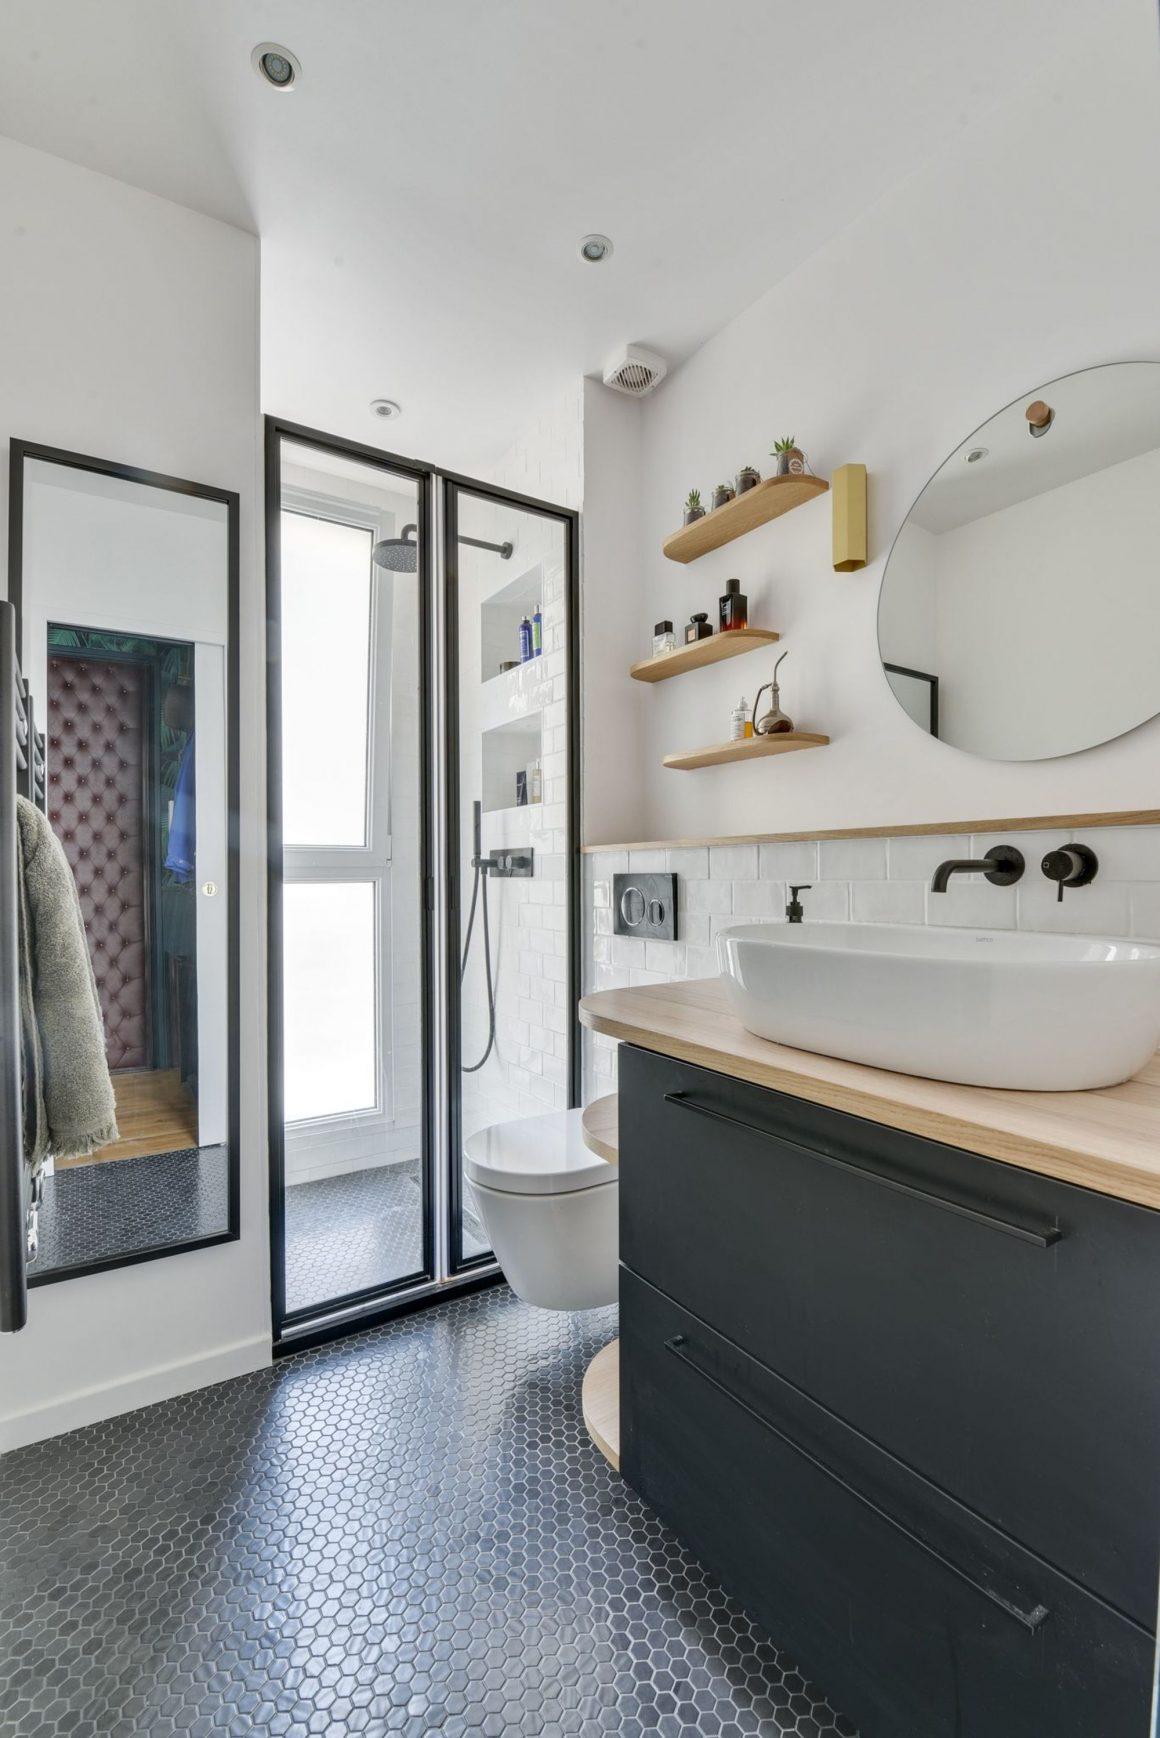 mobilier-vasque-en-bleu-et-porte-douche-transparente